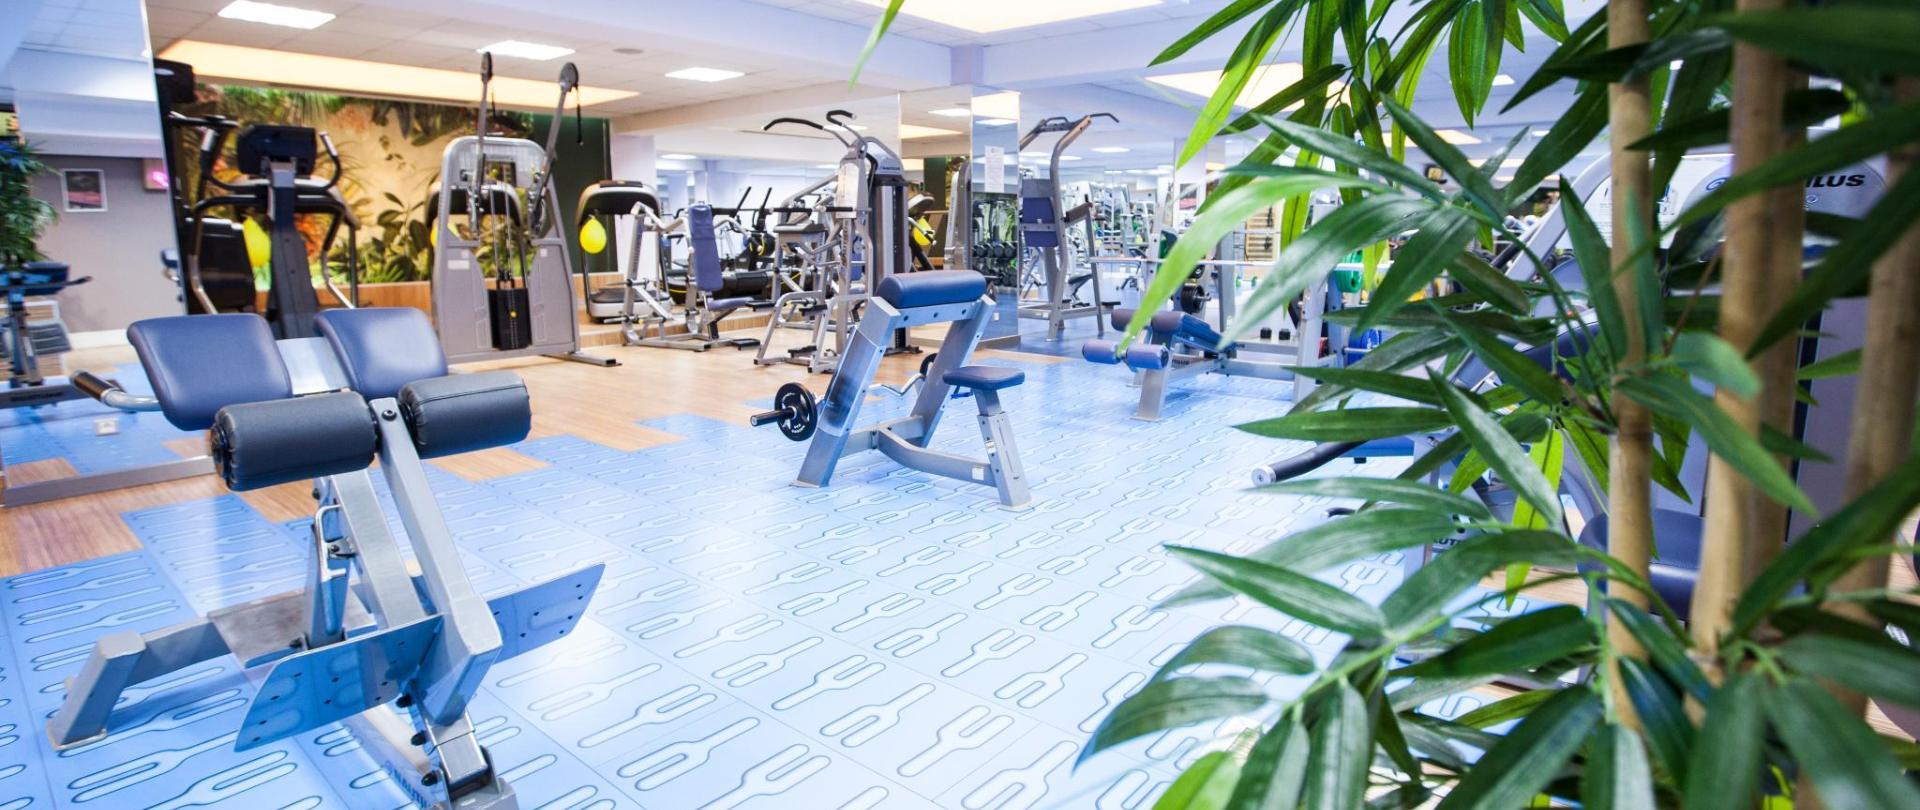 sala fitness 8.jpg